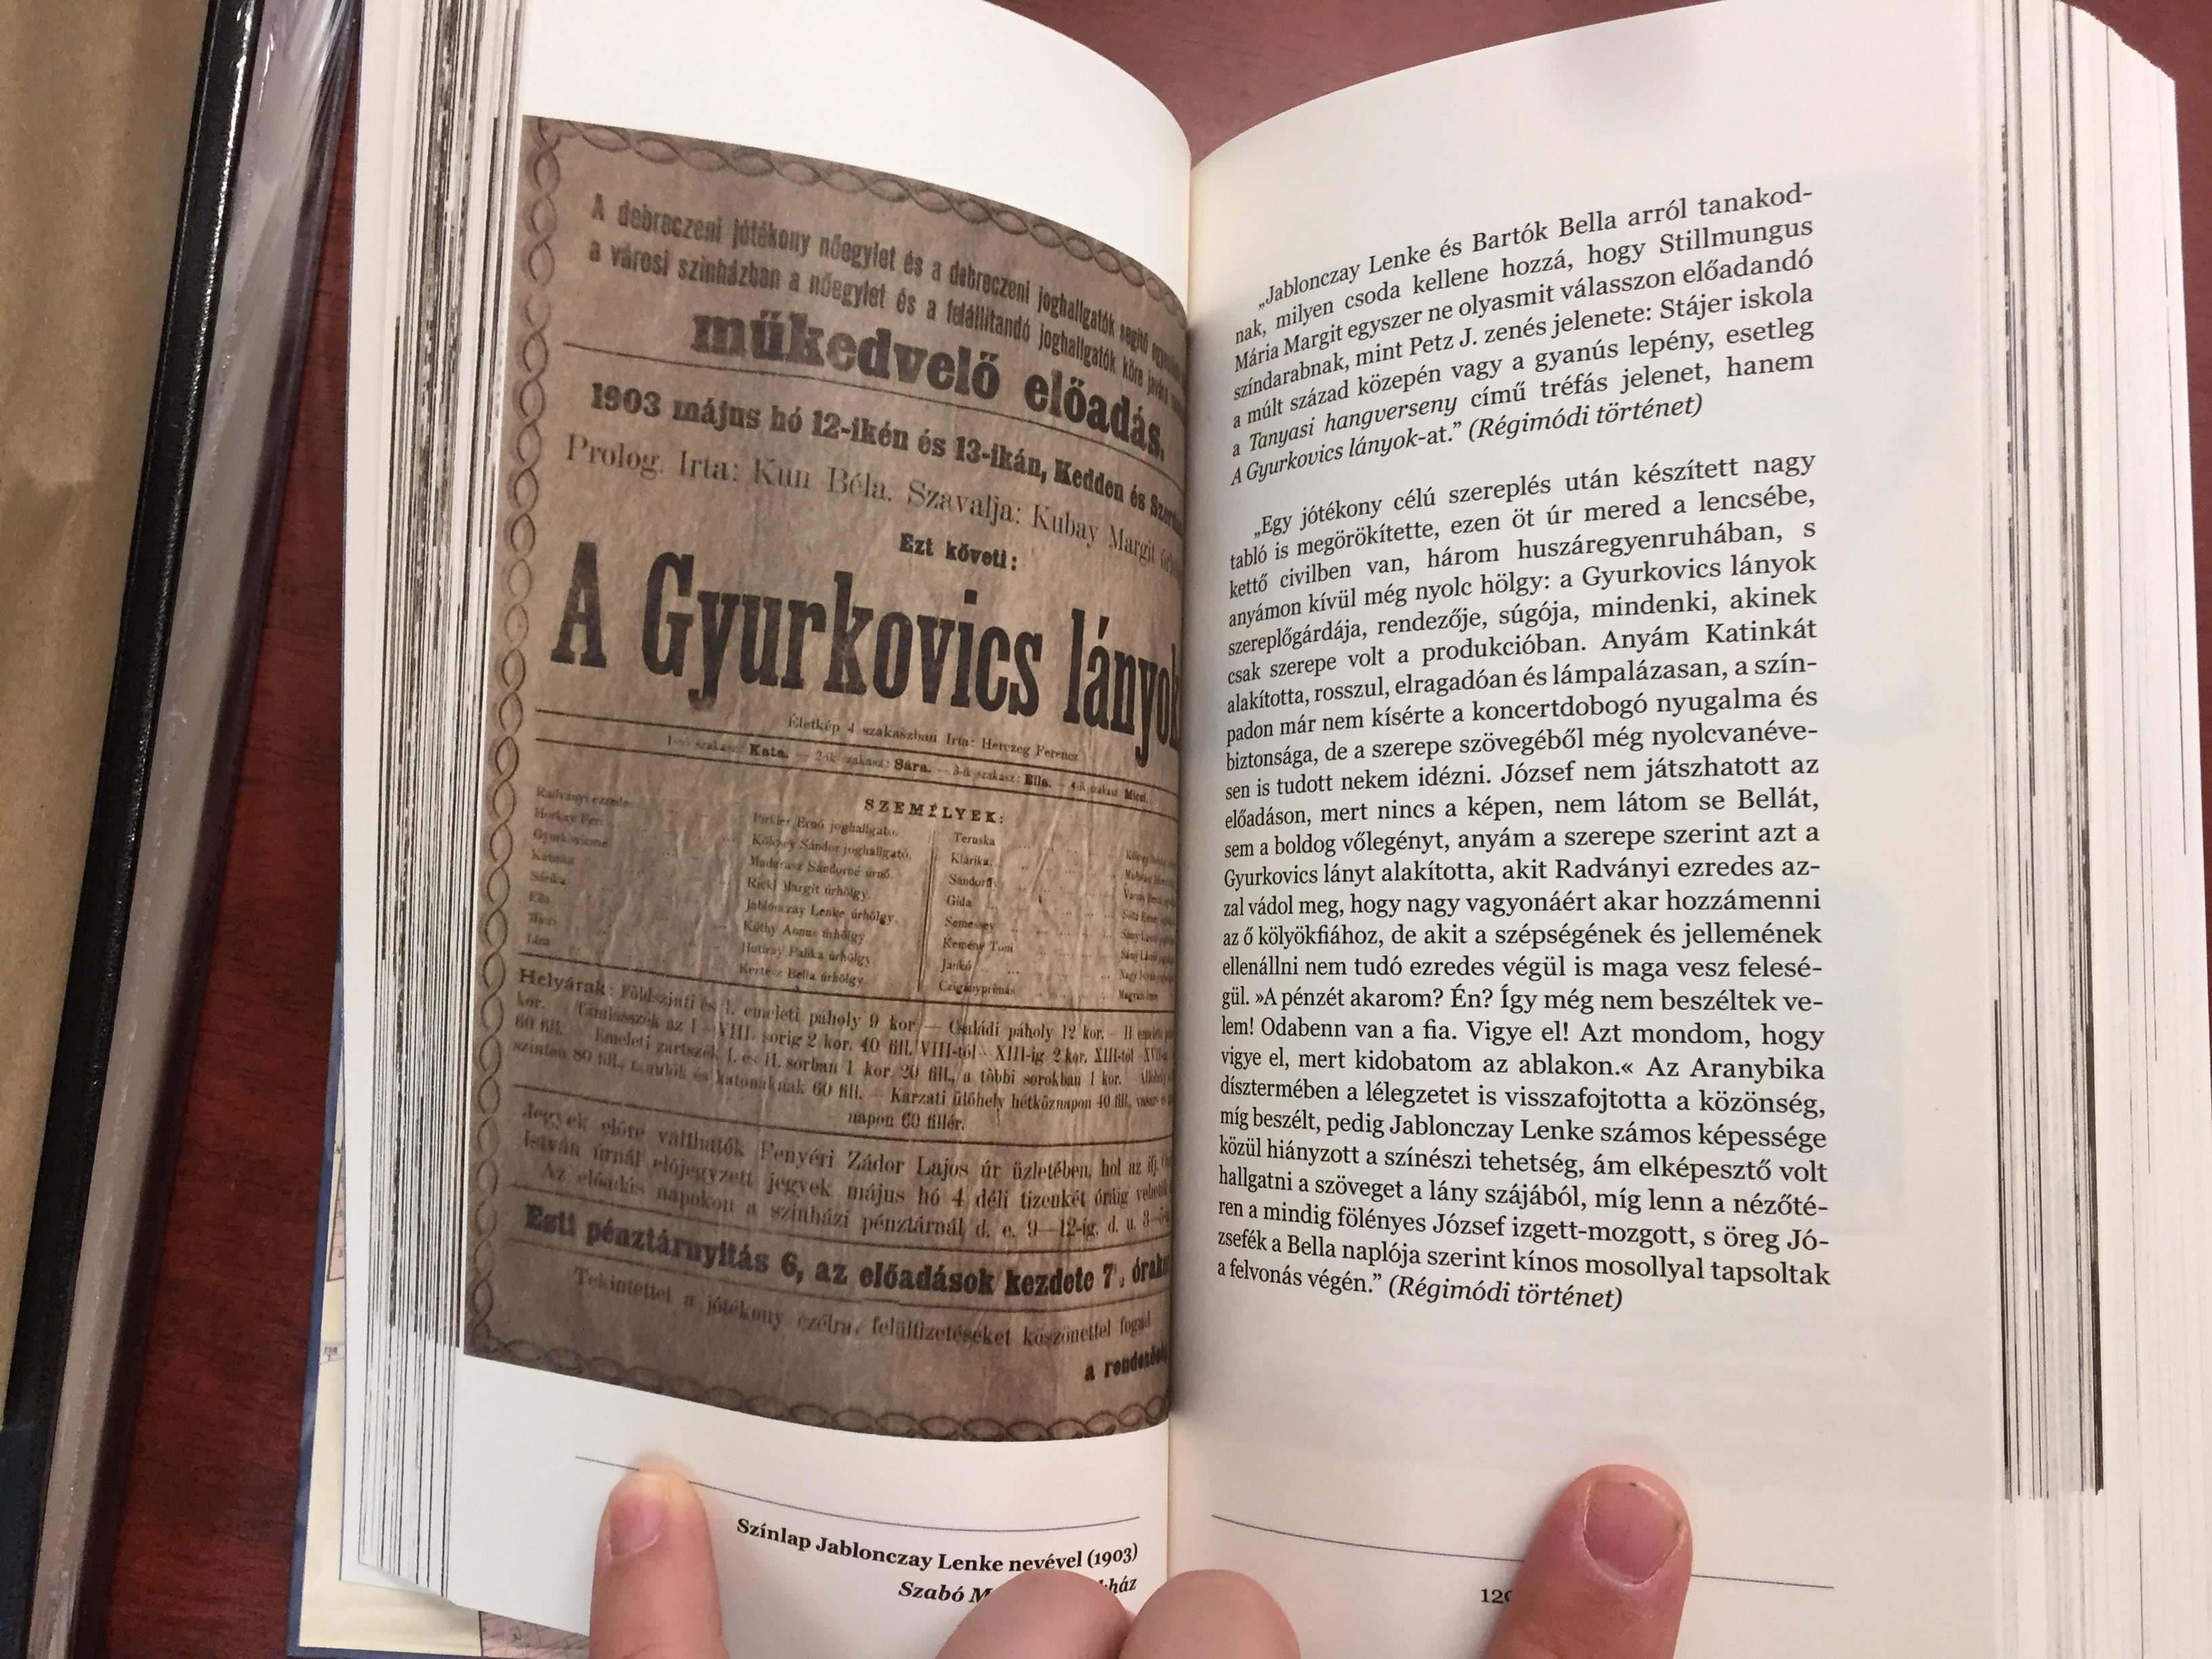 szab-magda-debrecene-irodalmi-tikalauz-hungarian-language-literary-guide-to-the-city-of-debrecen-debreceni-reform-tus-koll-gium-m-zeuma-hardcover-2018-6-.jpg